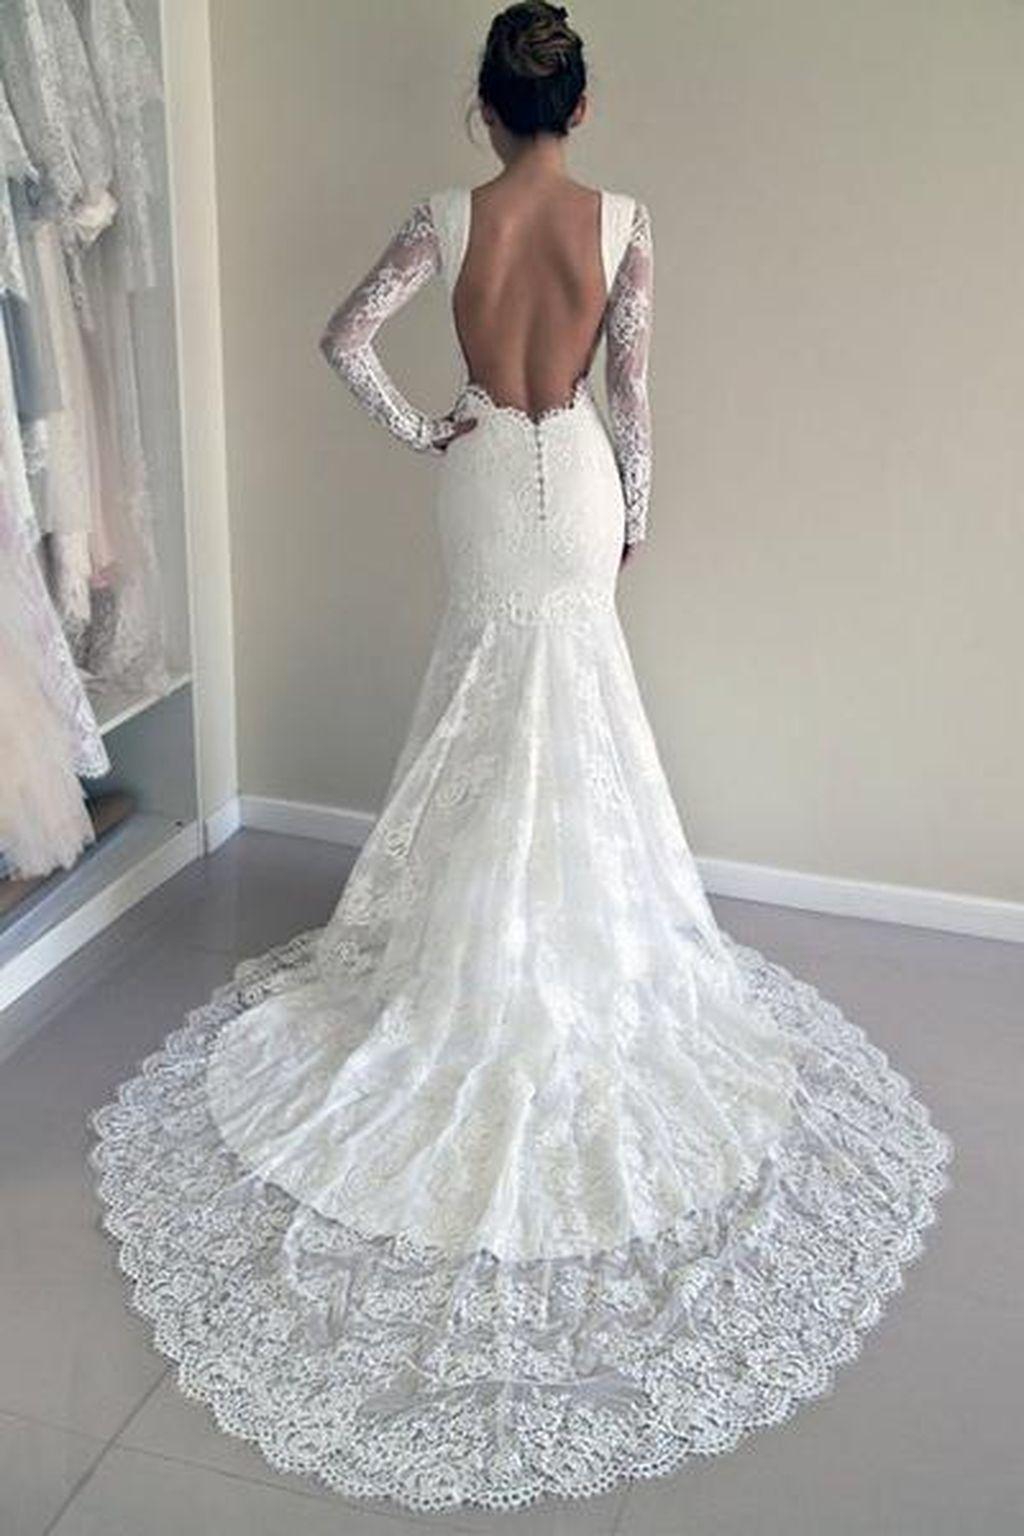 After wedding dress ideas   Stunning Mermaid Wedding Dress Ideas Every Women Will Love